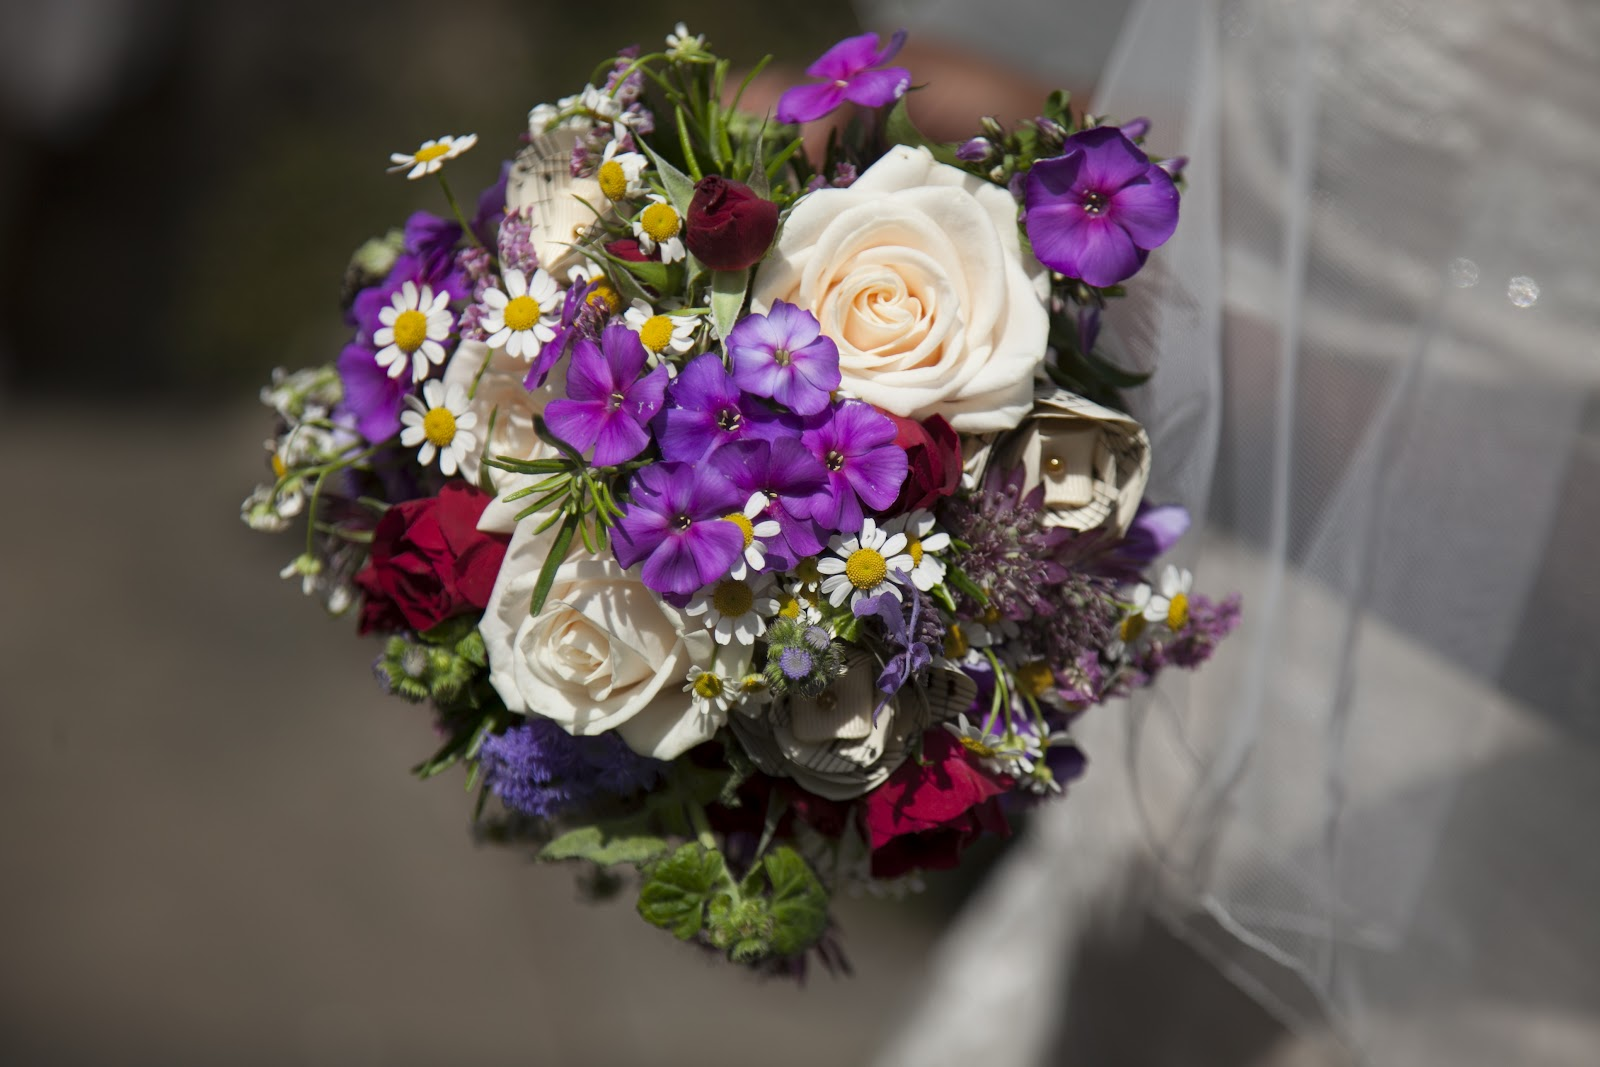 Fabia Turner: Wedding Flowers on the Cheap!